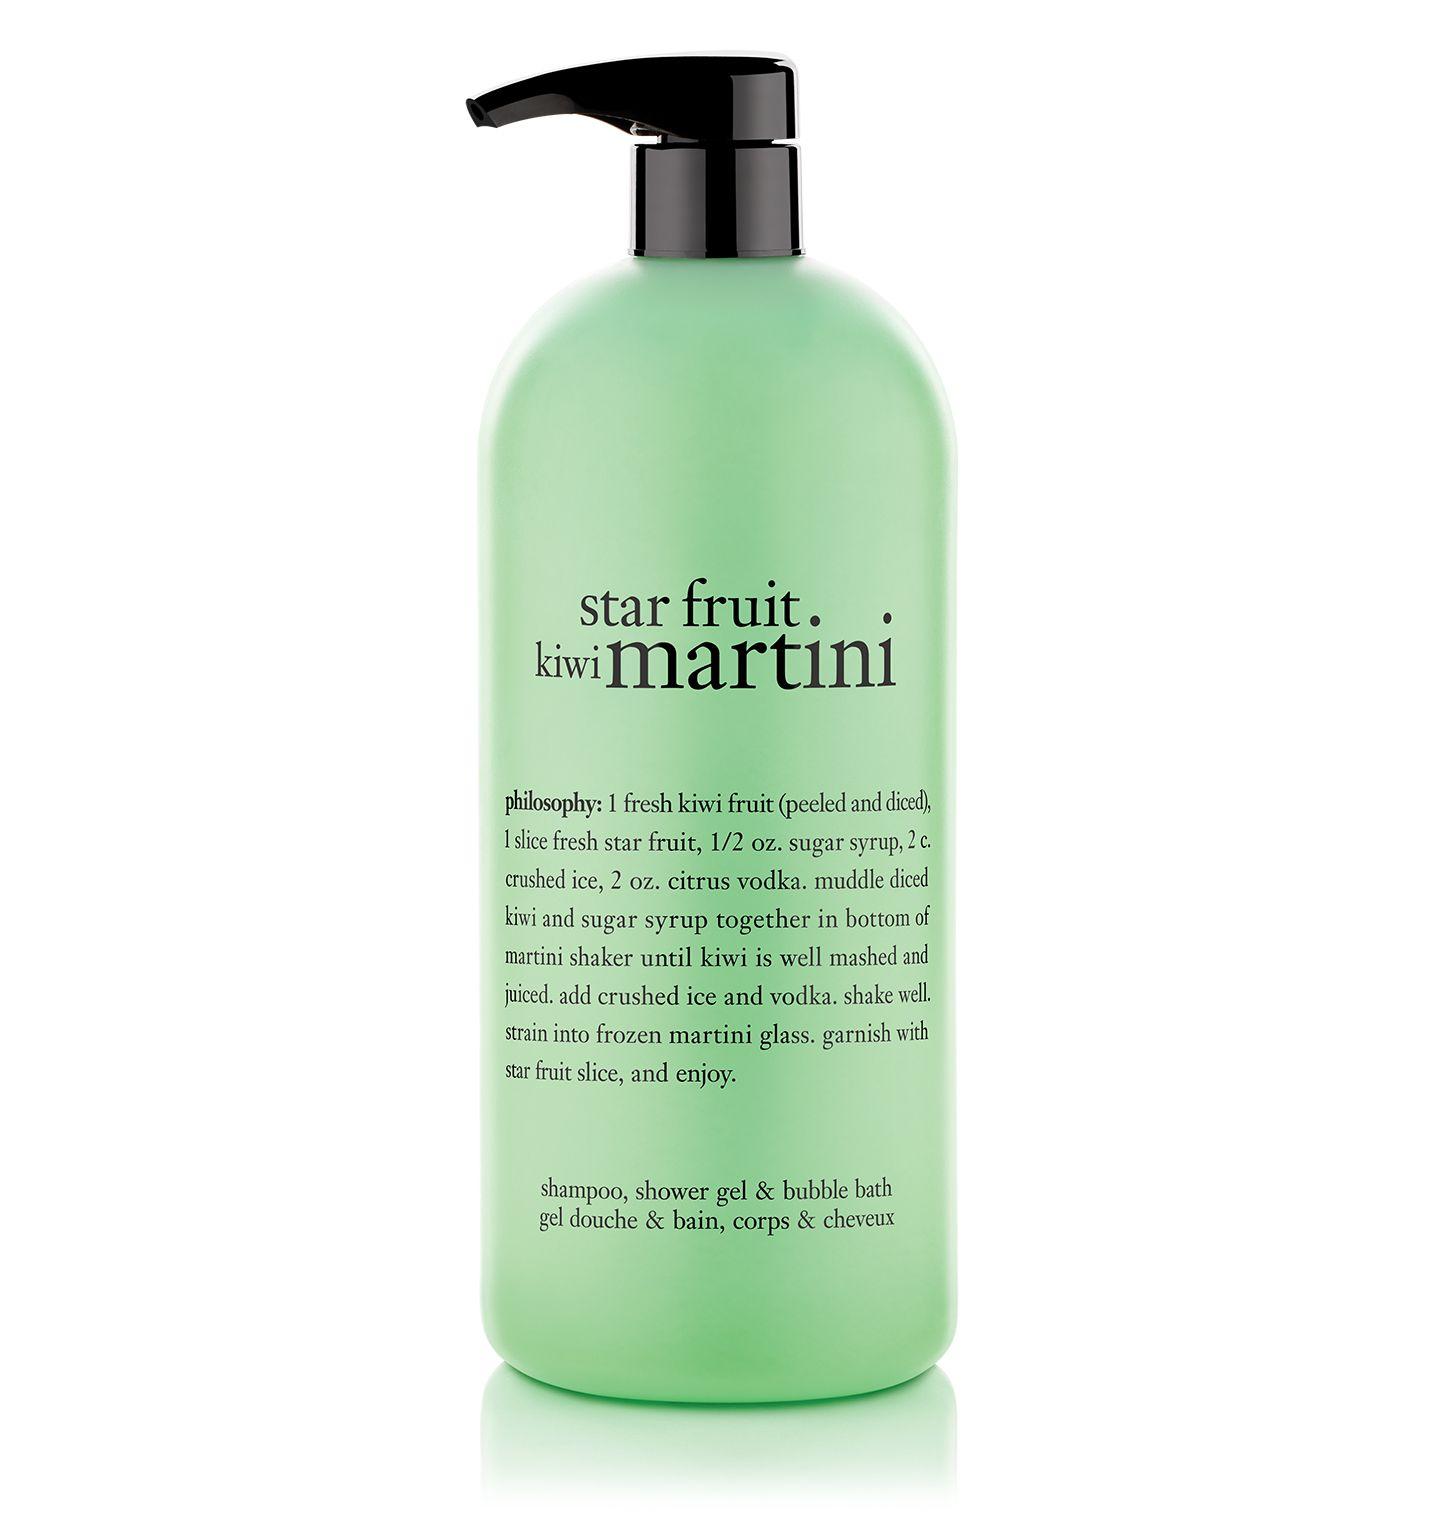 Starfruit Kiwi Martini Shower Gel Shower Gel Bath And Body Beautiful Skin Care